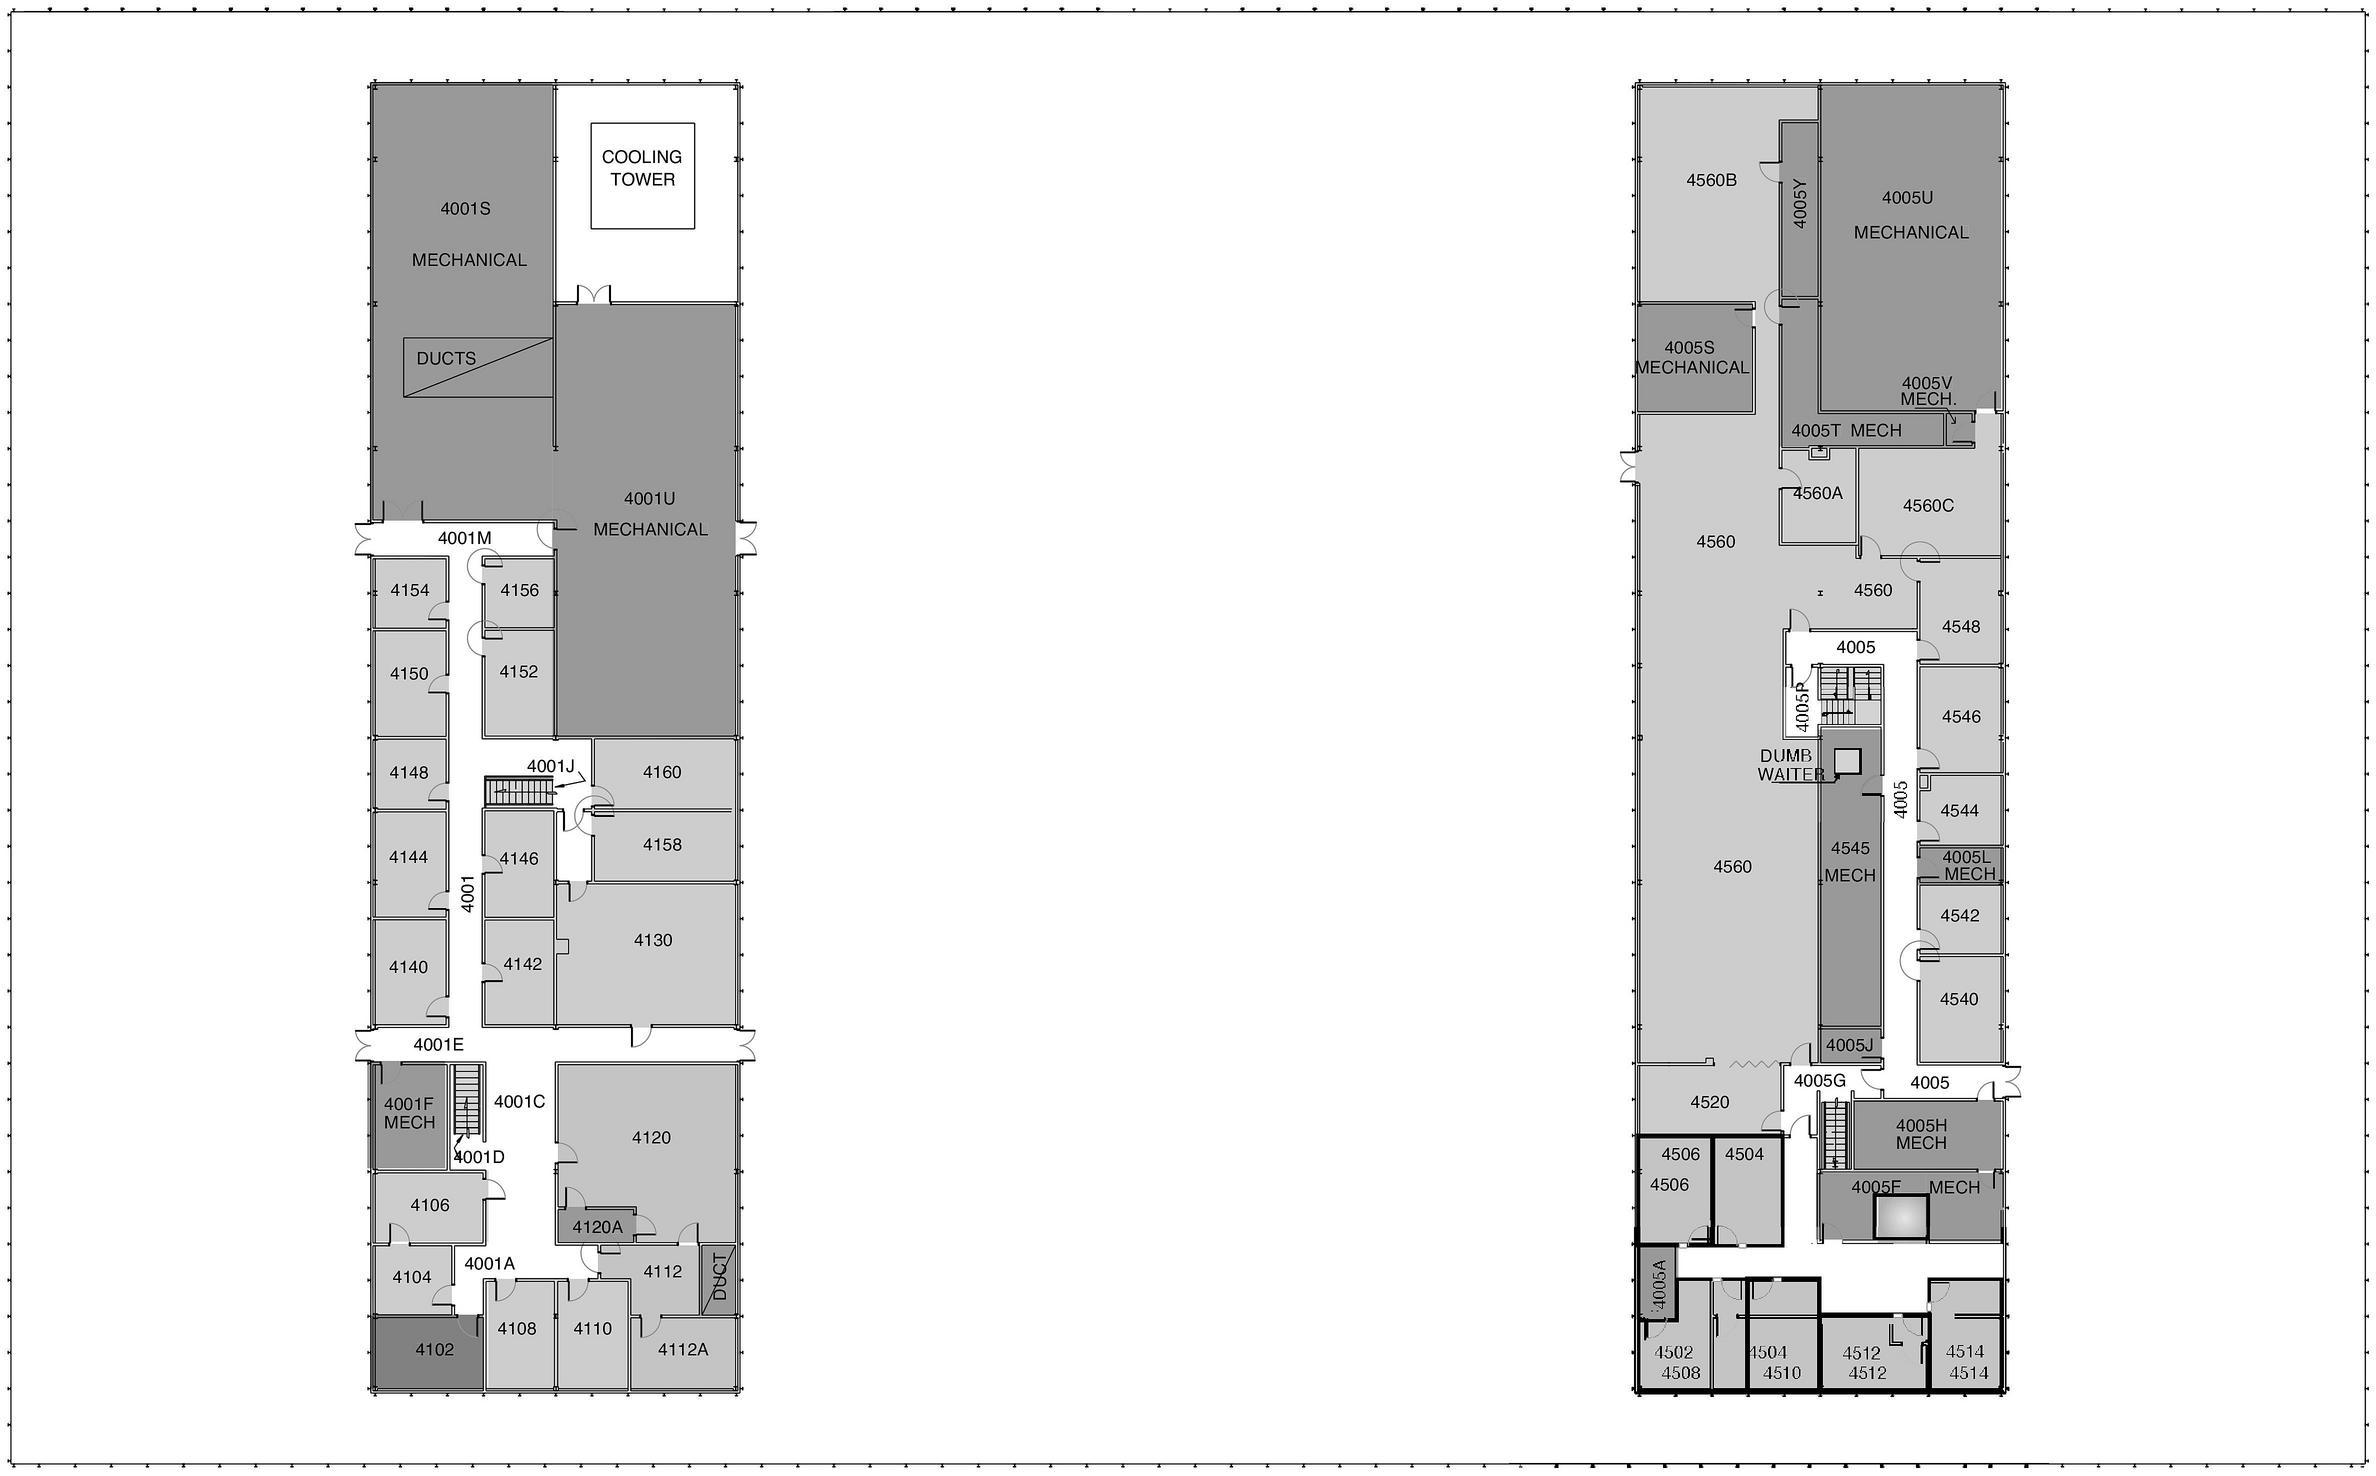 www/floormap/meb4fl-5.jpg